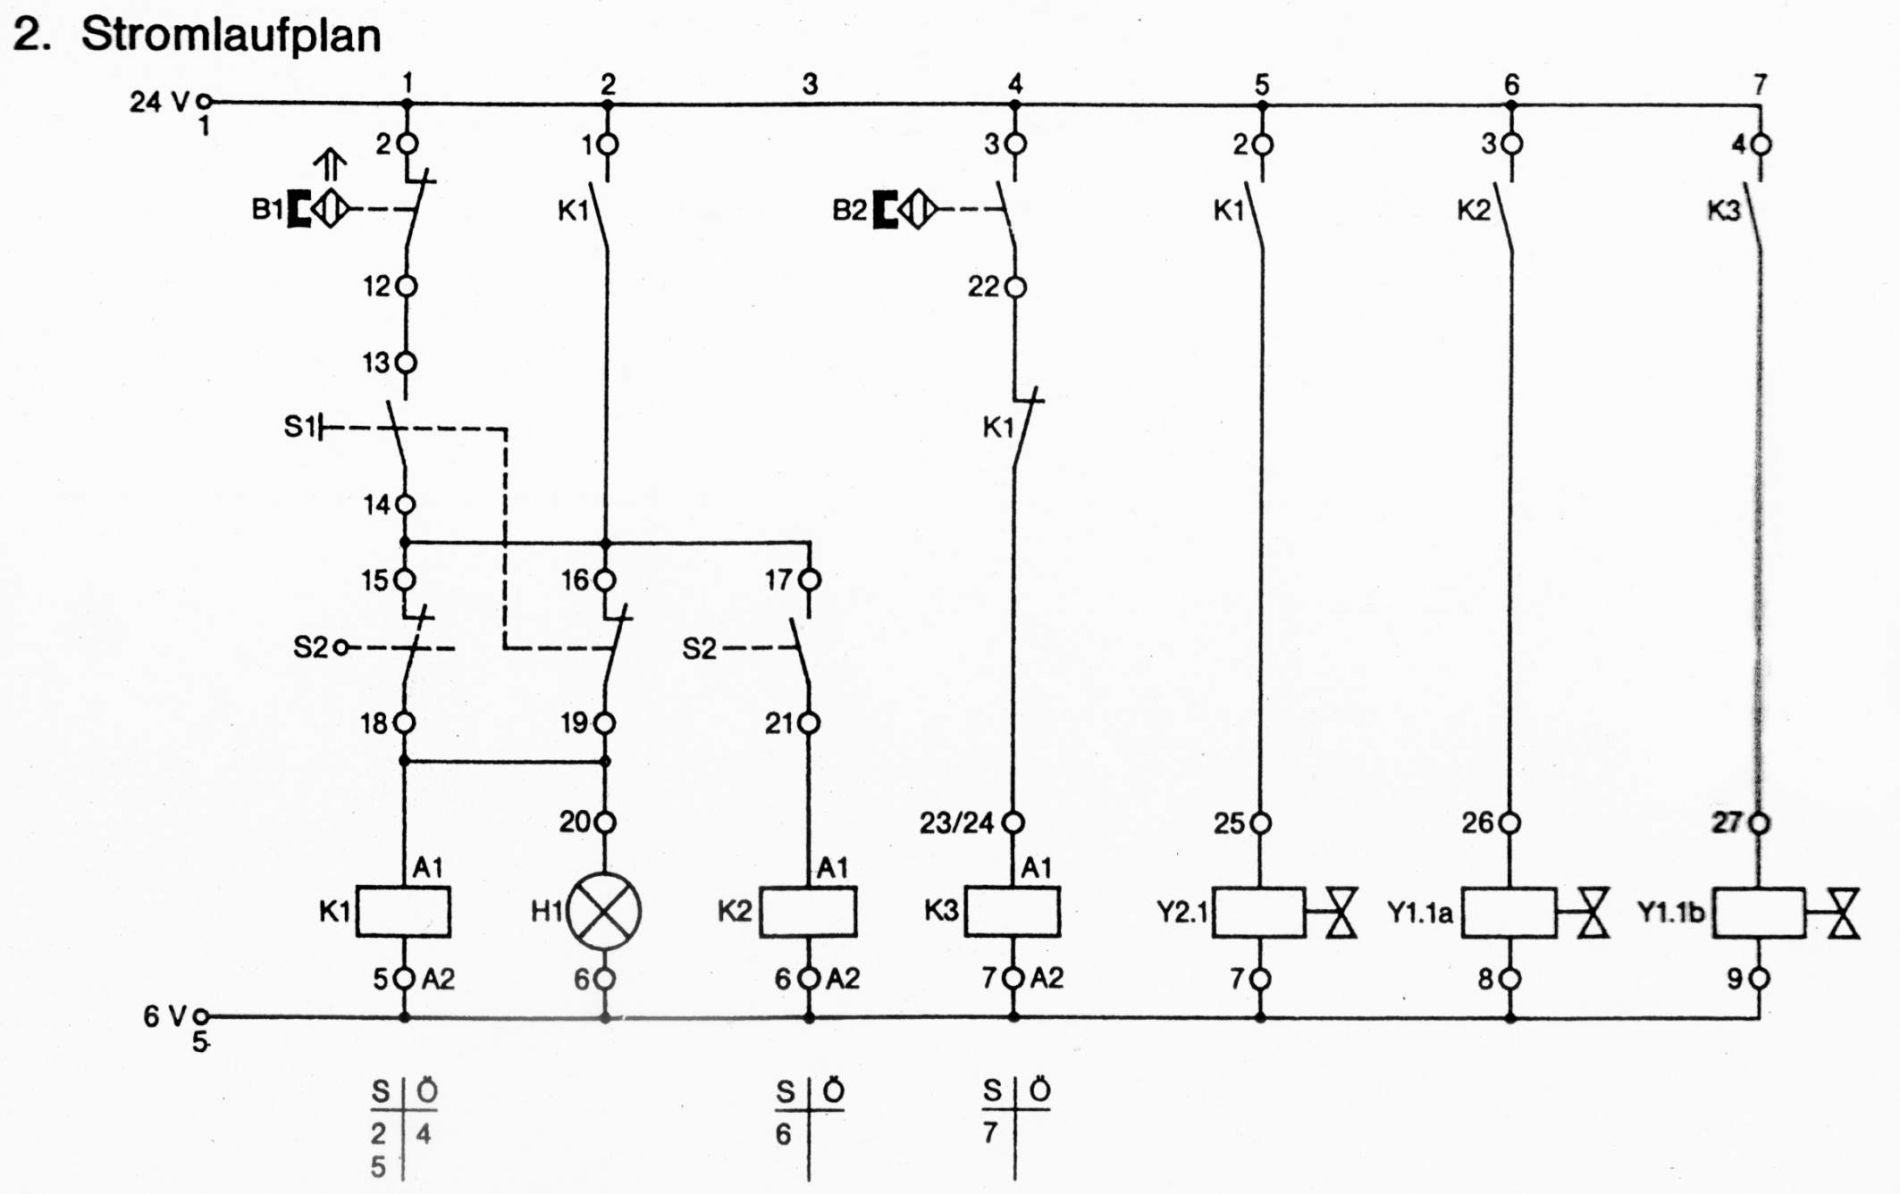 Elektropneumatik: Schaltplan (Umsetzung siehe nächstes Bild)